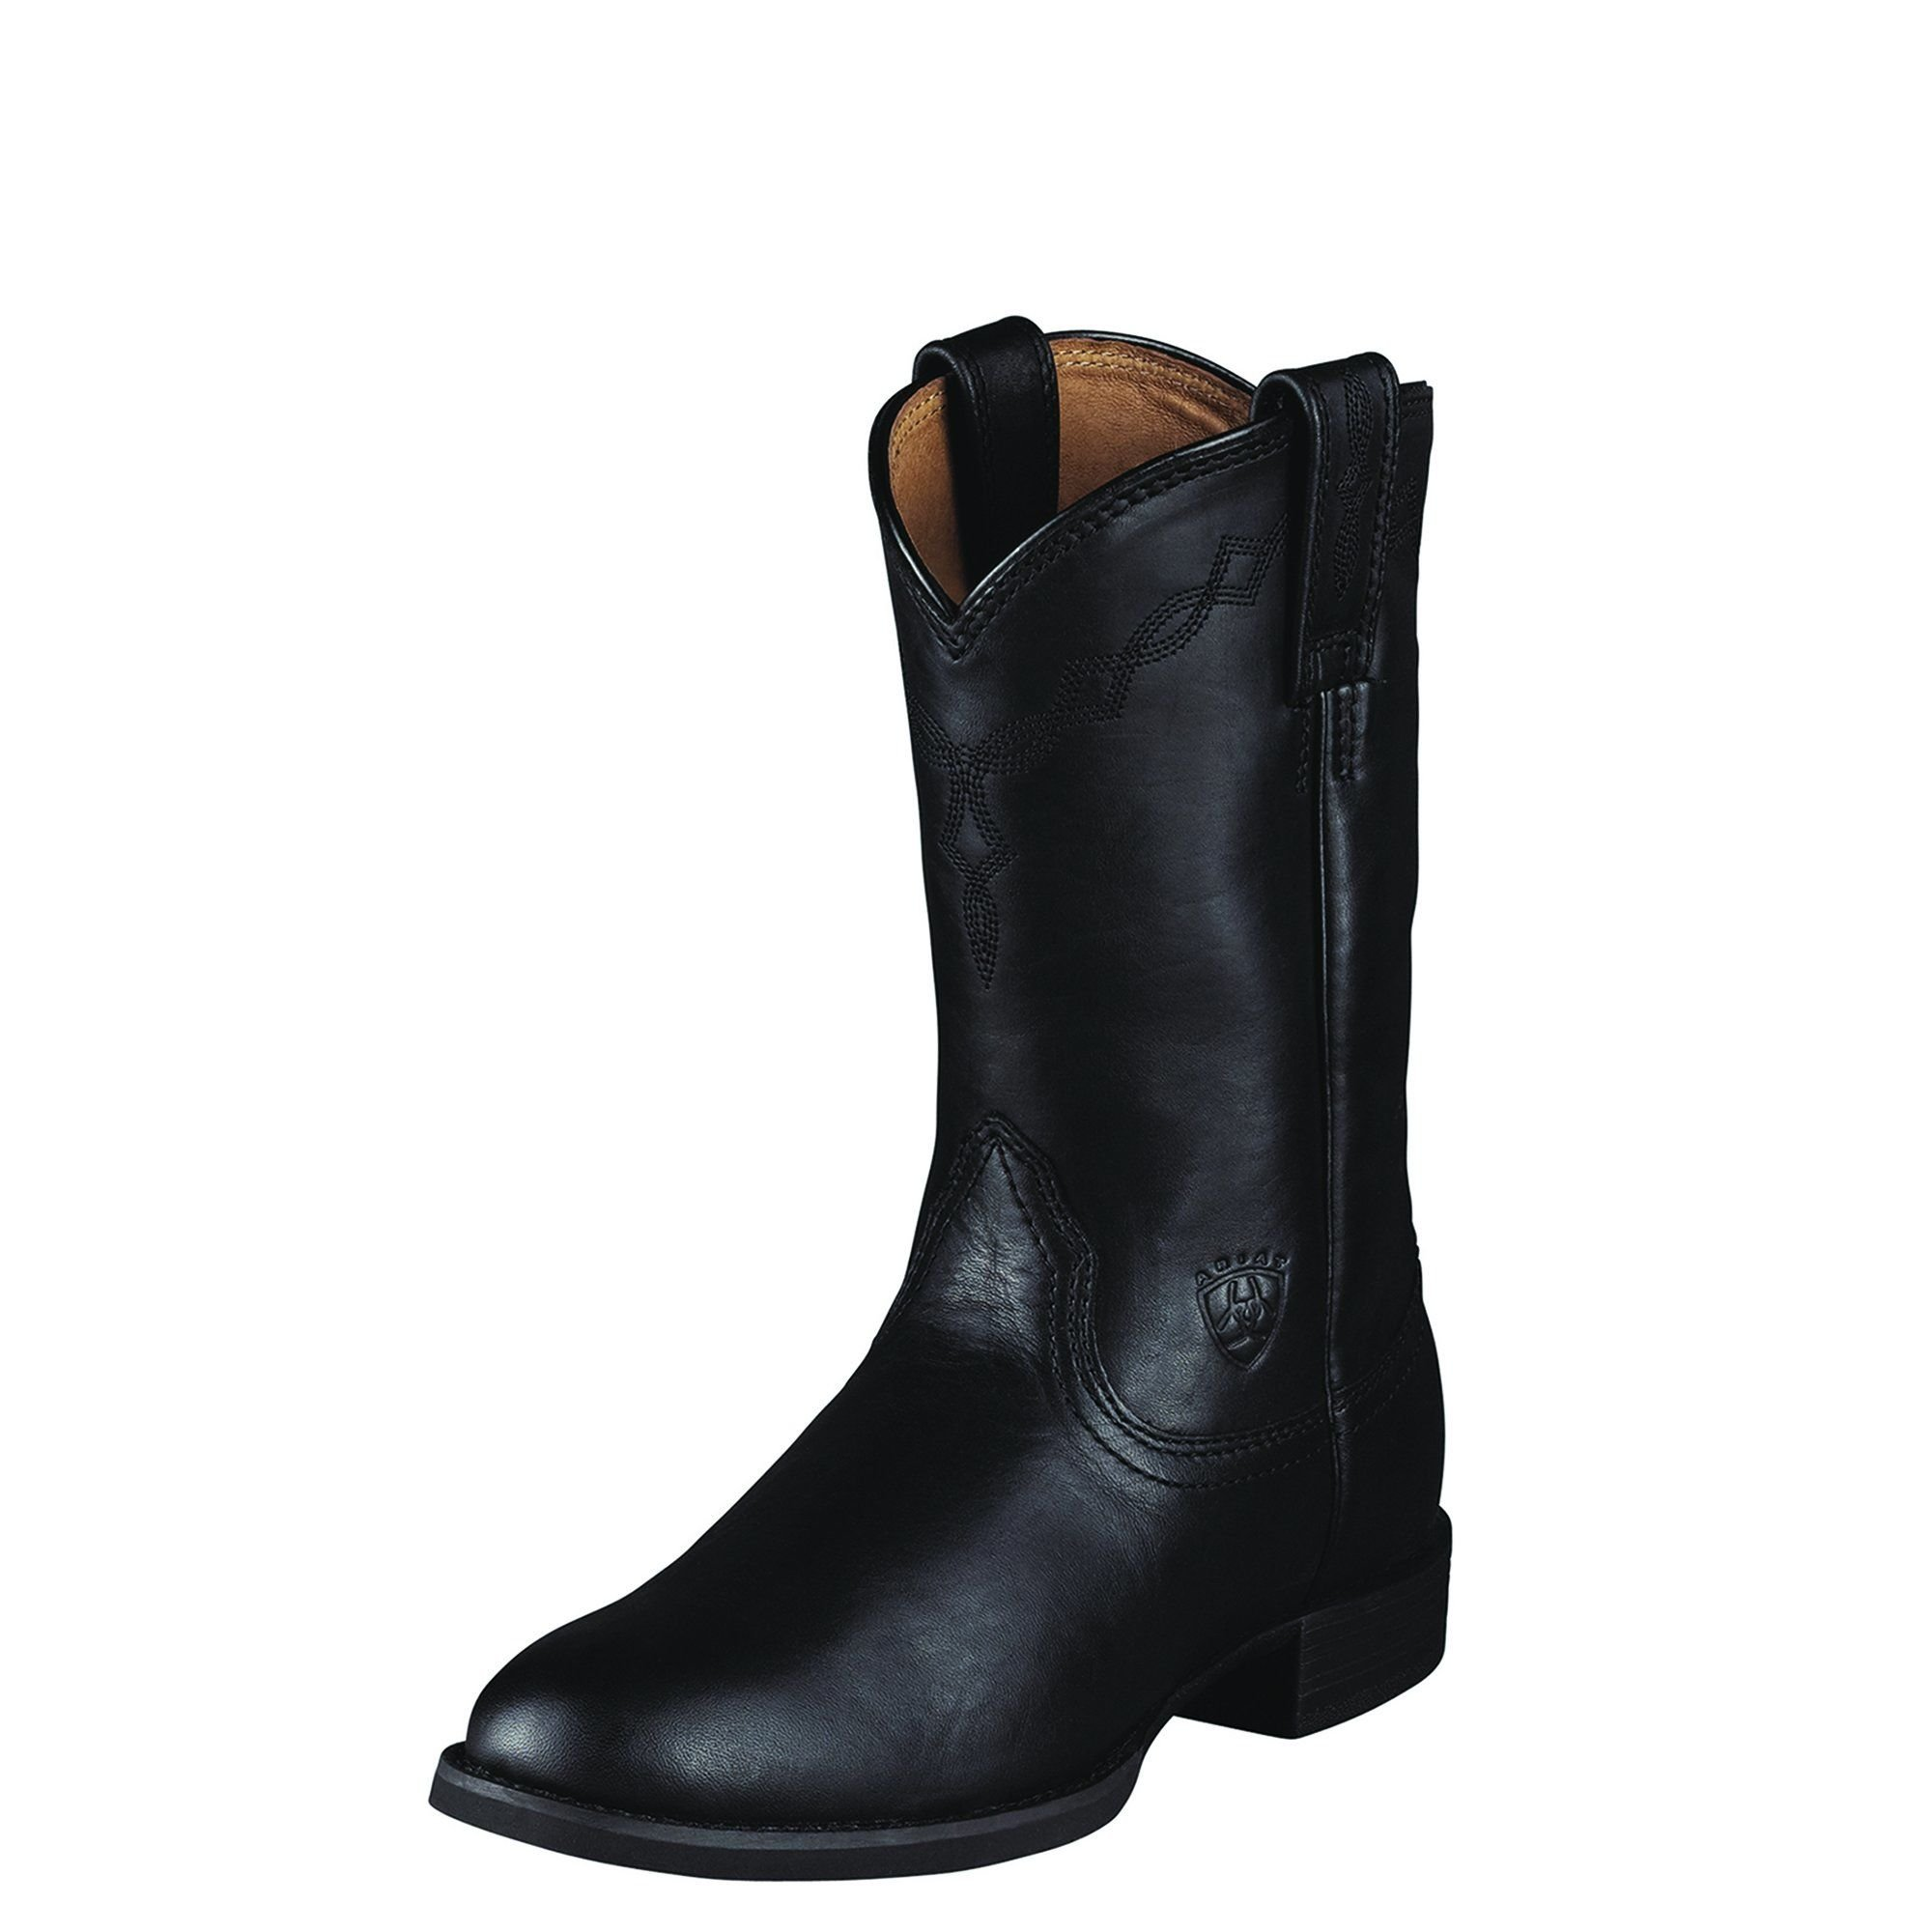 Ariat Women's Heritage Roper Western Cowboy Boot, Black, 10 C US